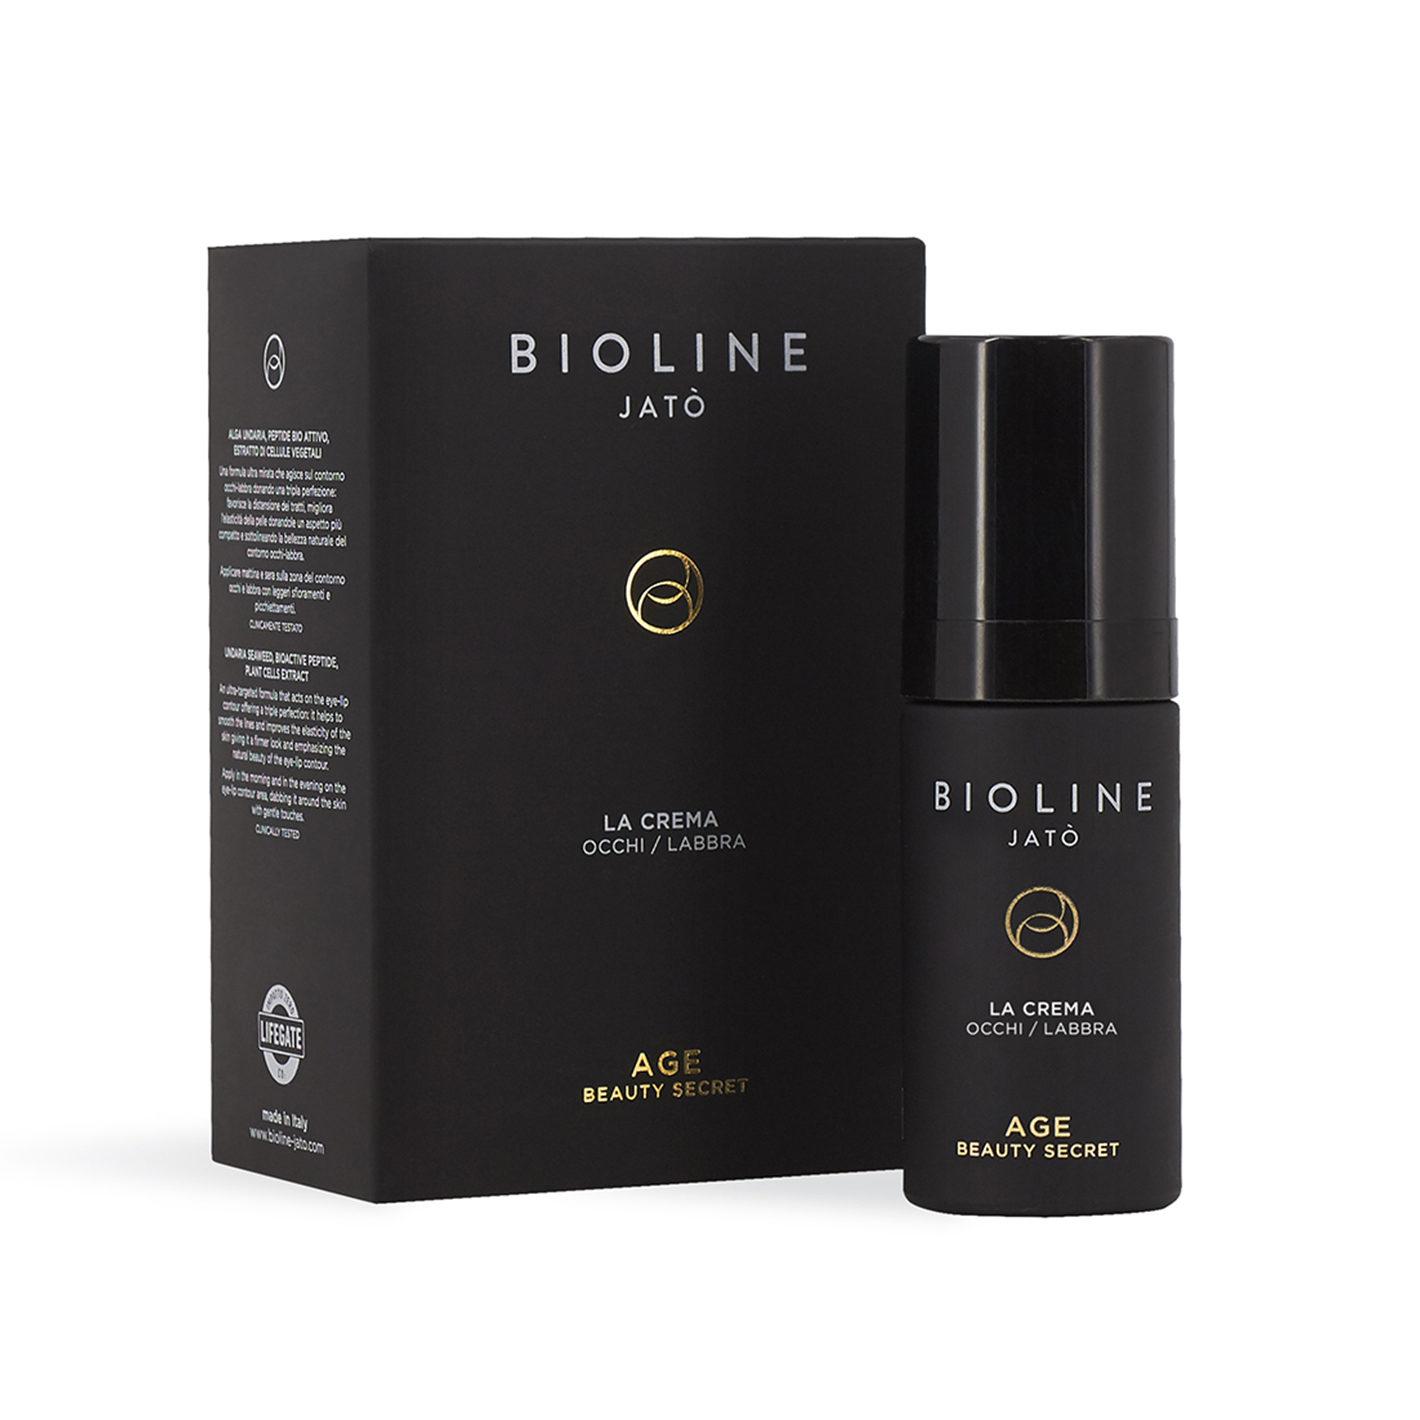 Age Beauty Secret - La Crema Occhi/Labbra